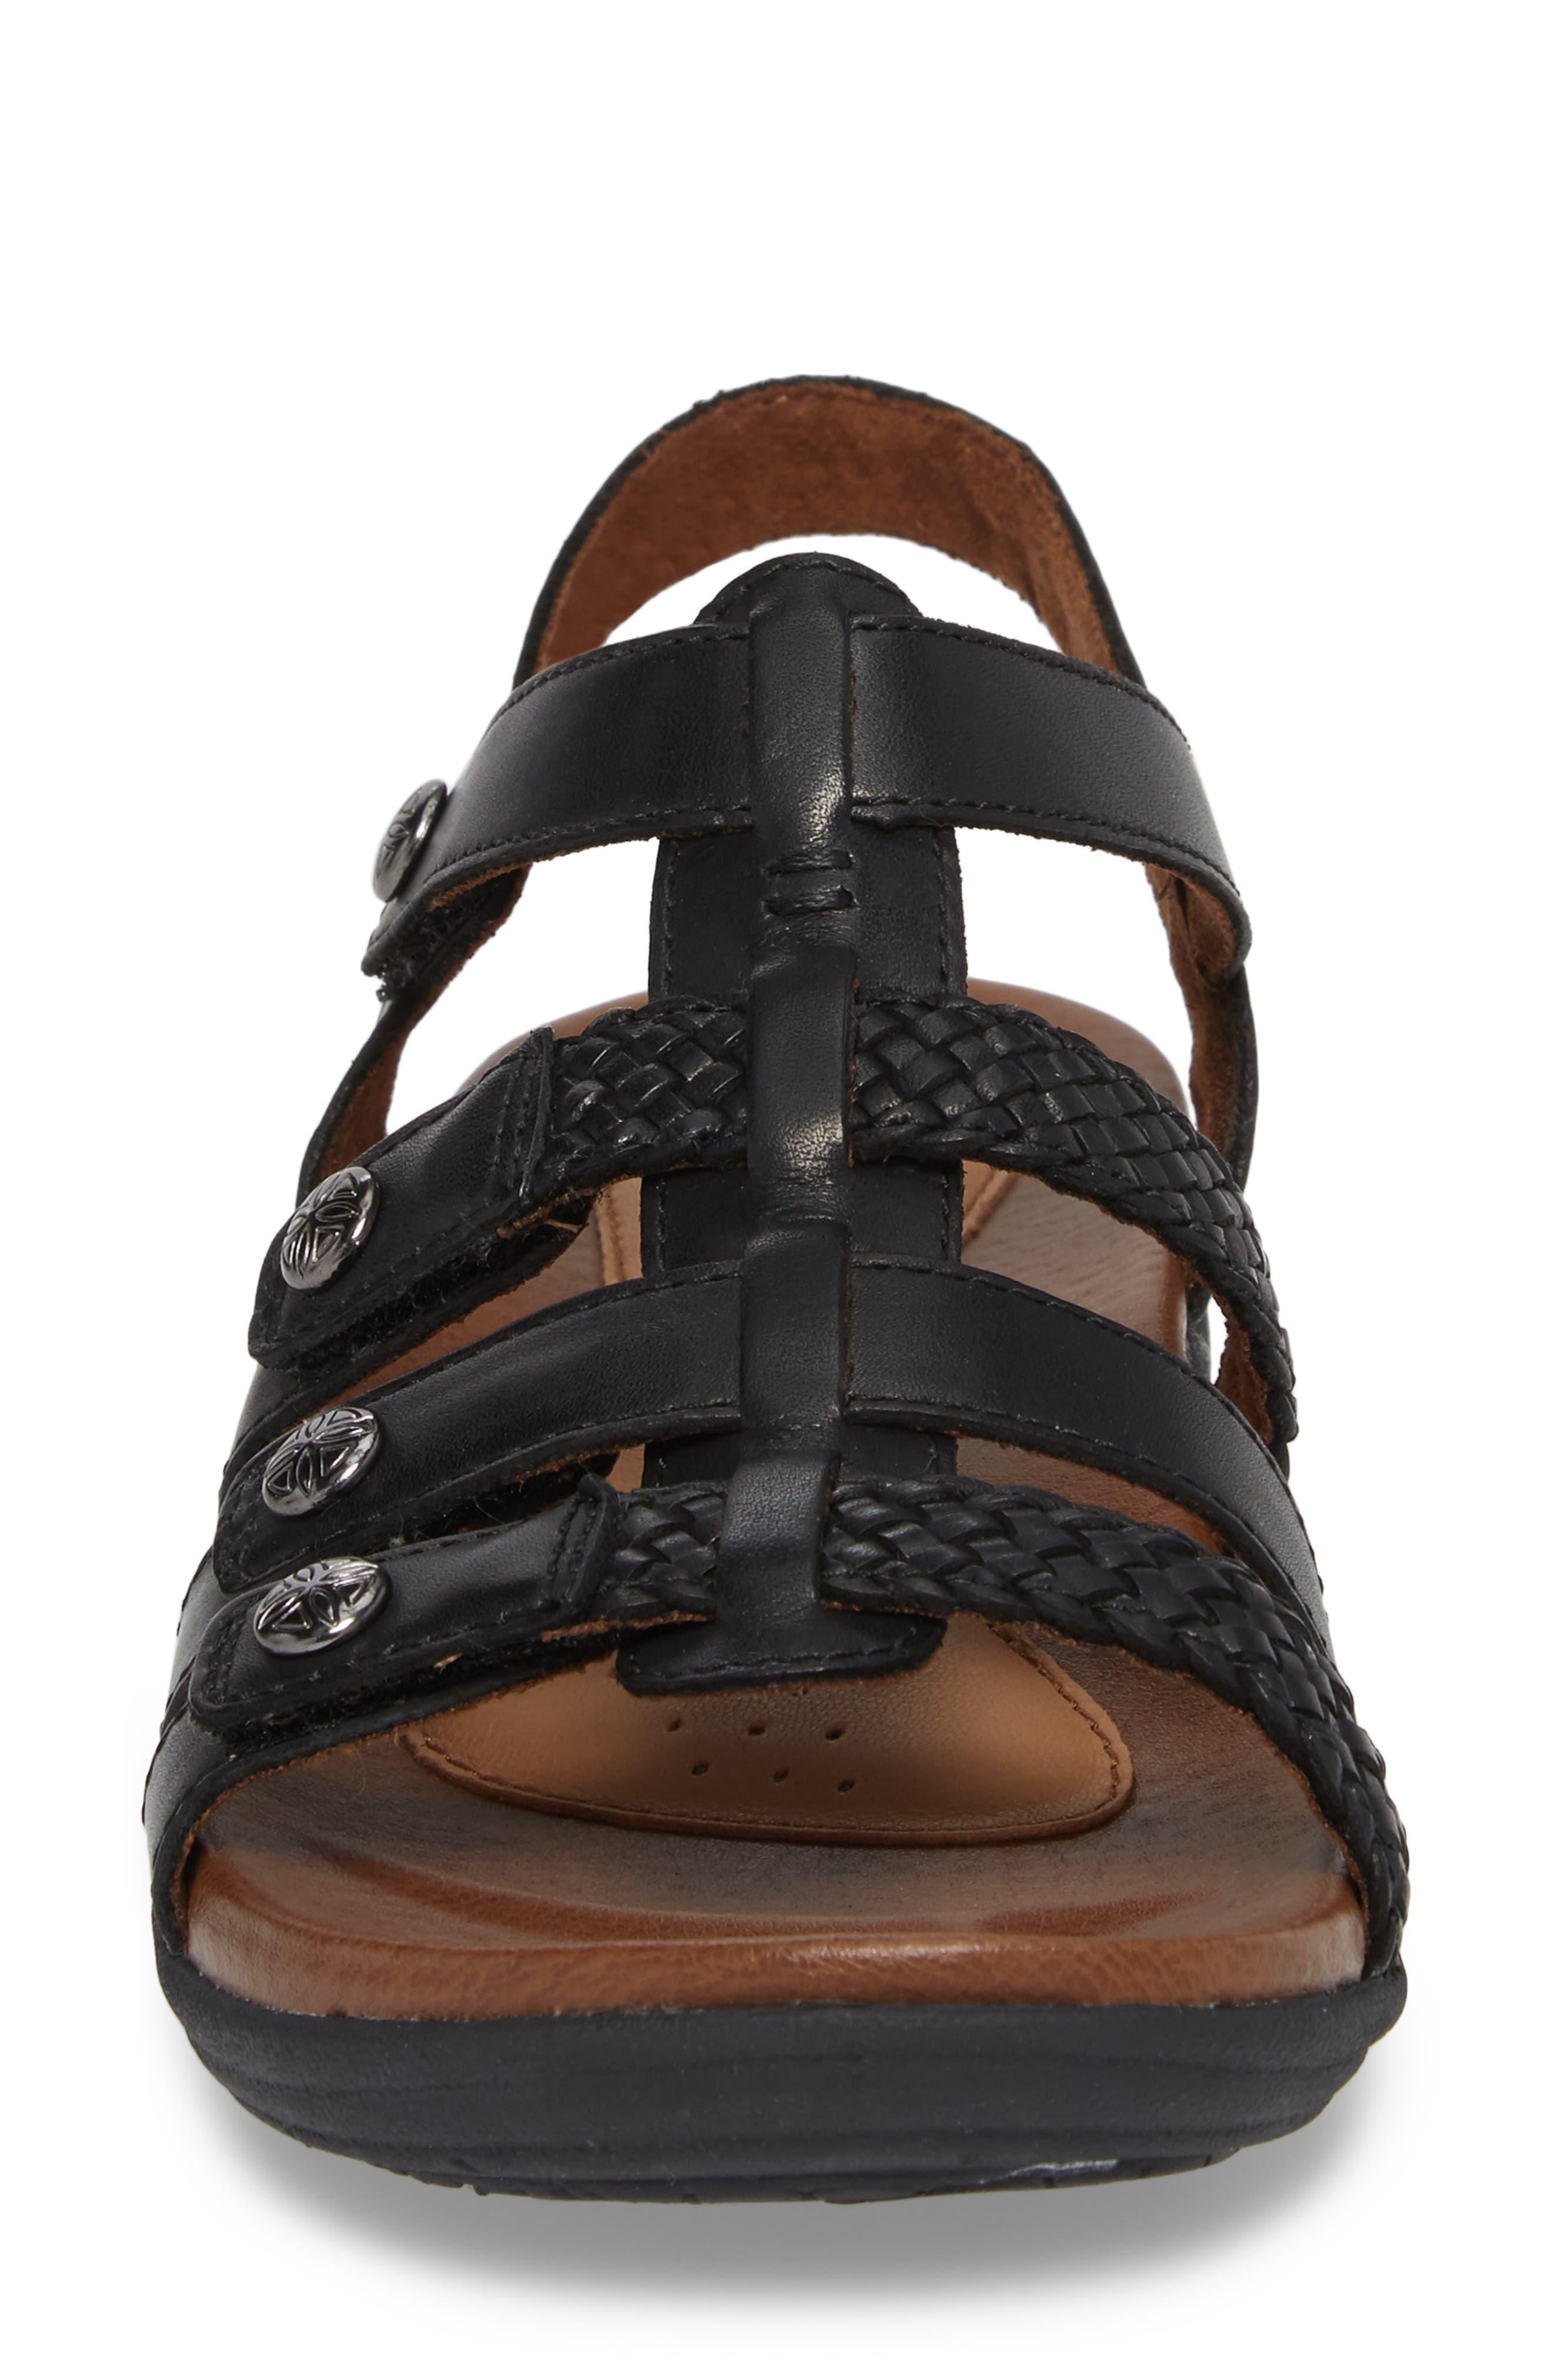 Rubey T-Strap Sandal,                             Alternate thumbnail 4, color,                             Black Leather